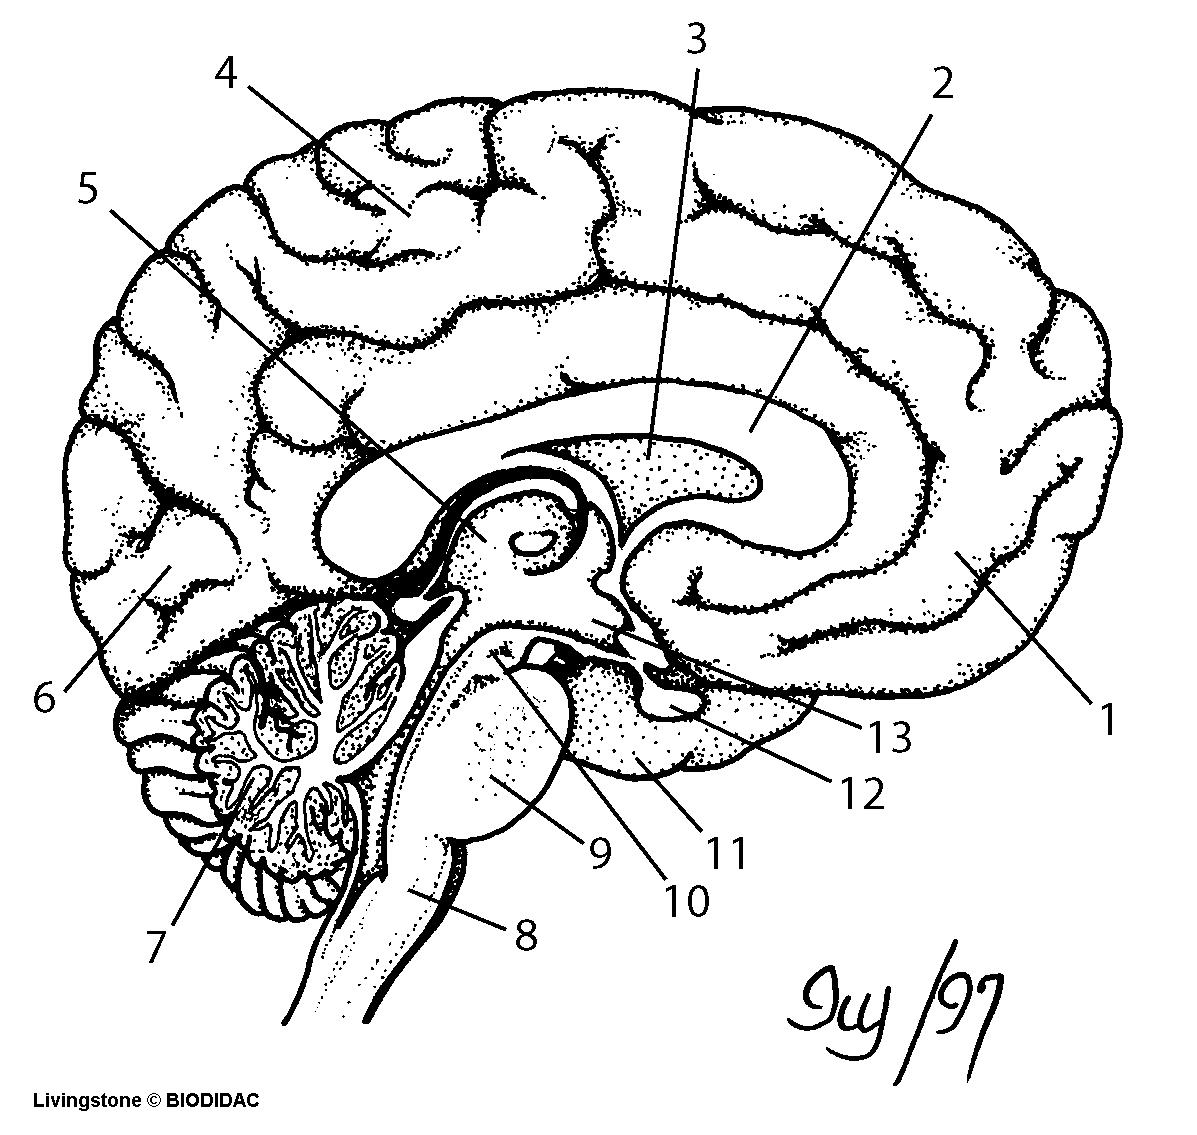 Brain Blank Diagram - ClipArt Best